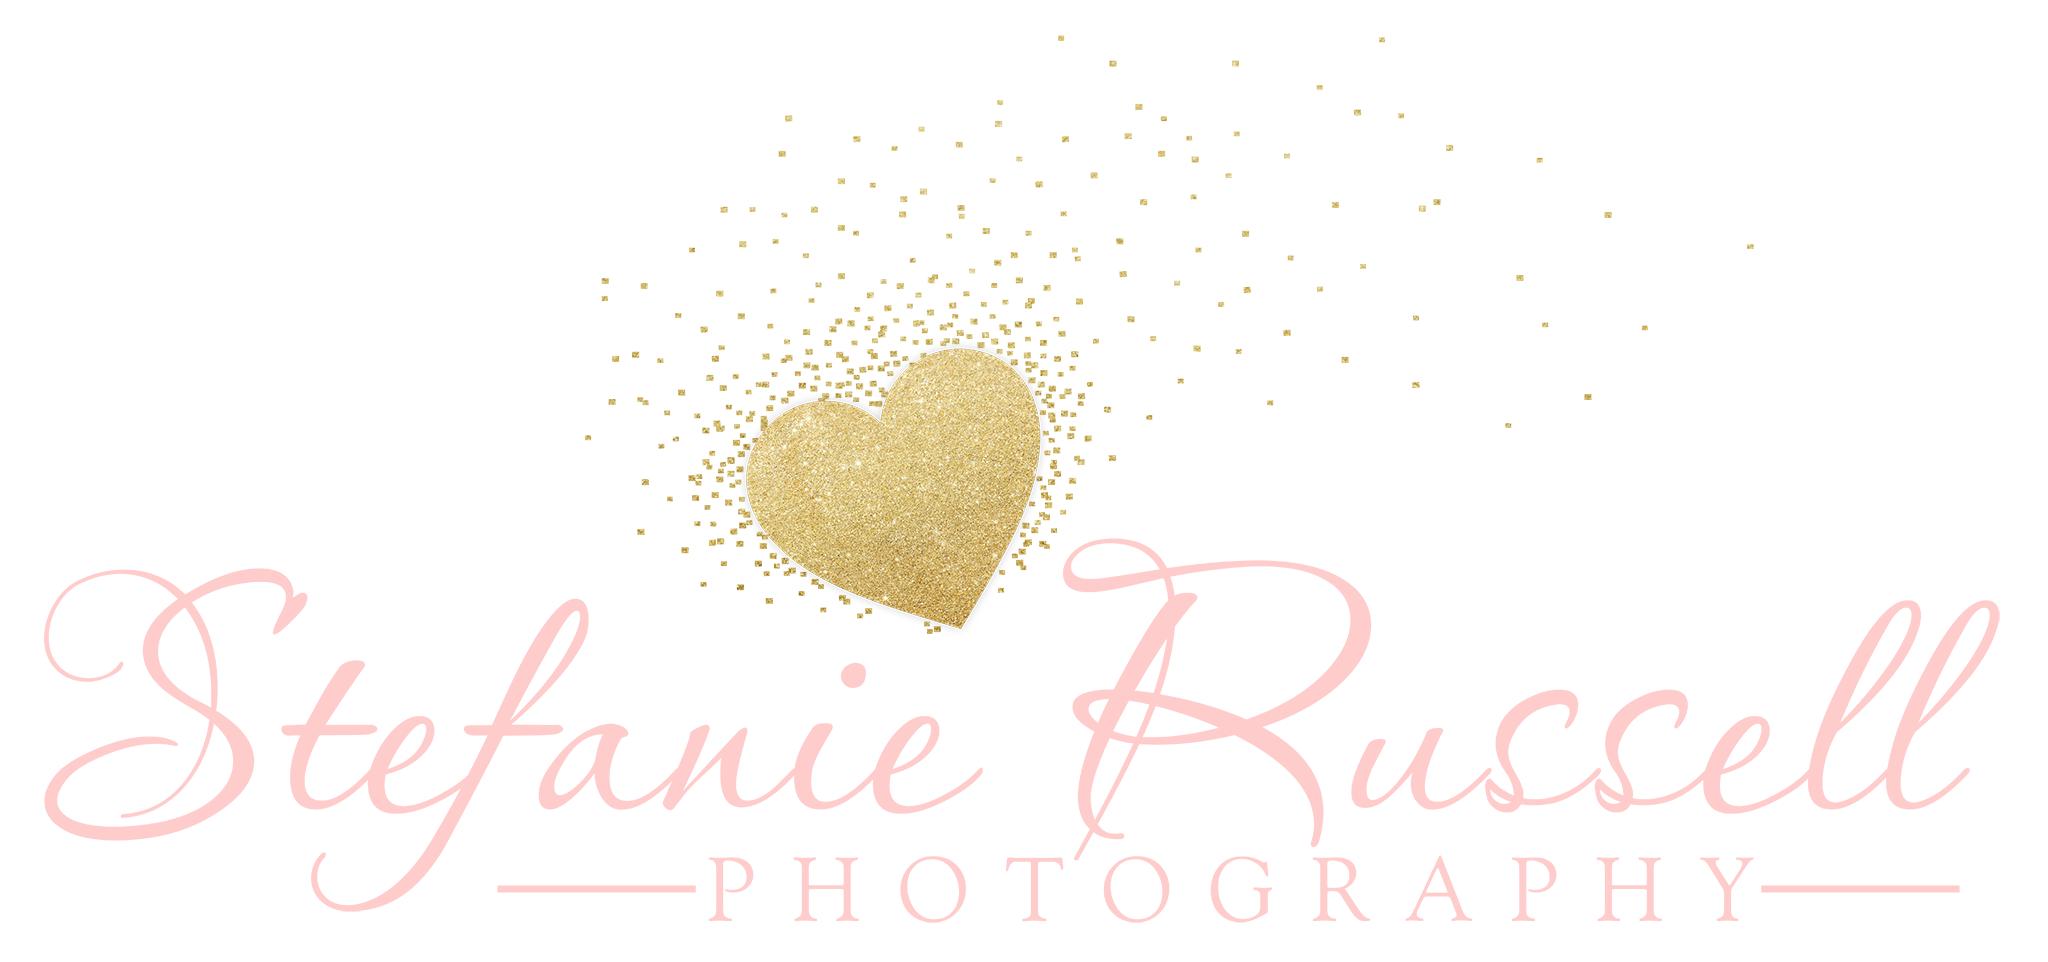 Stefanie russell logo 1 2048